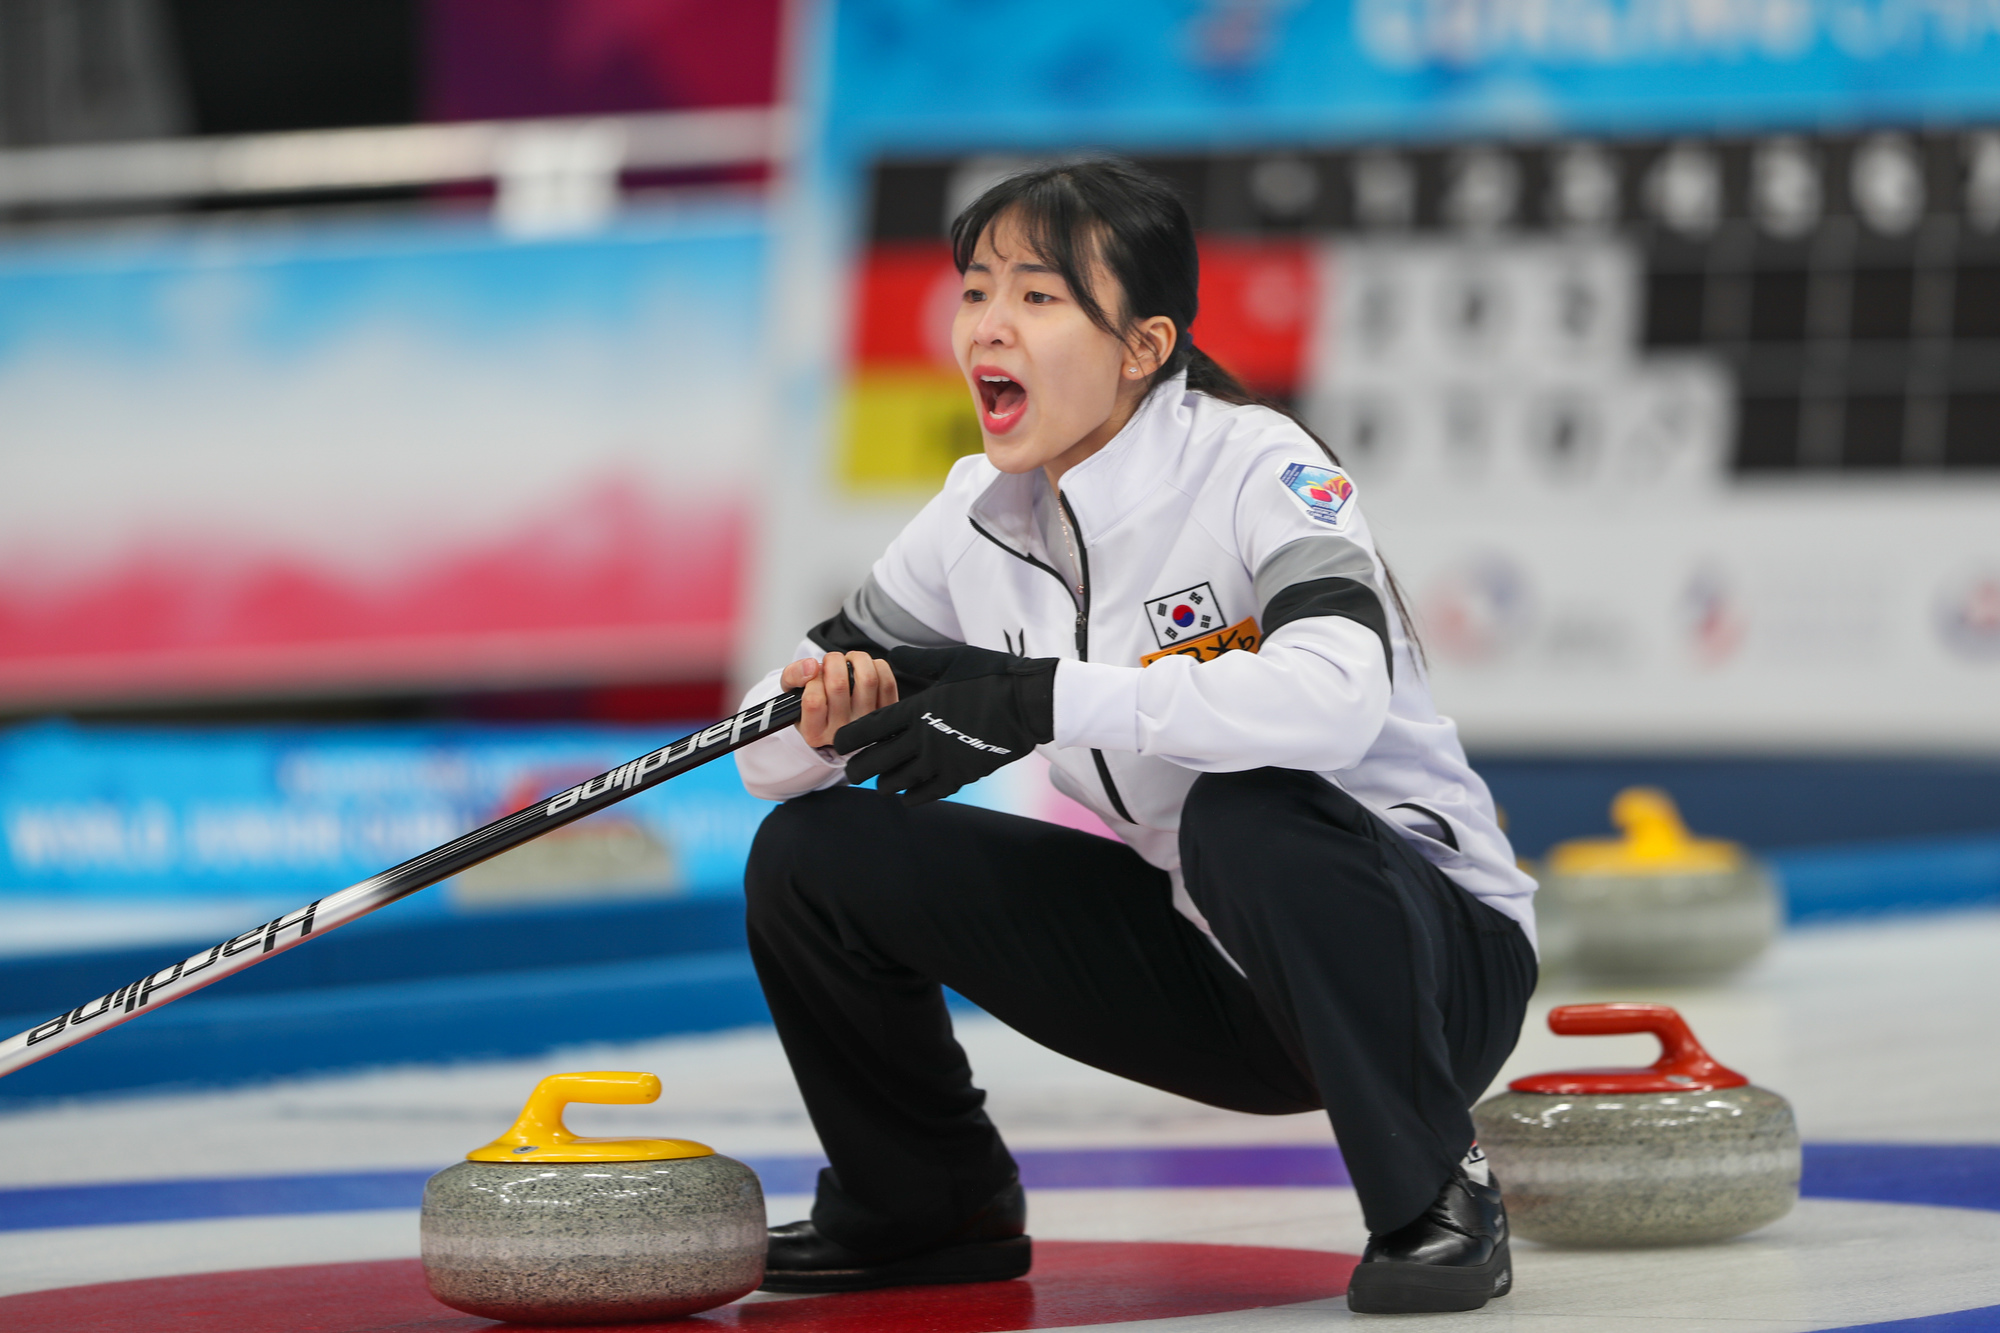 Korea women maintain unbeaten world juniors run in Krasnoyarsk - World Curling Federation